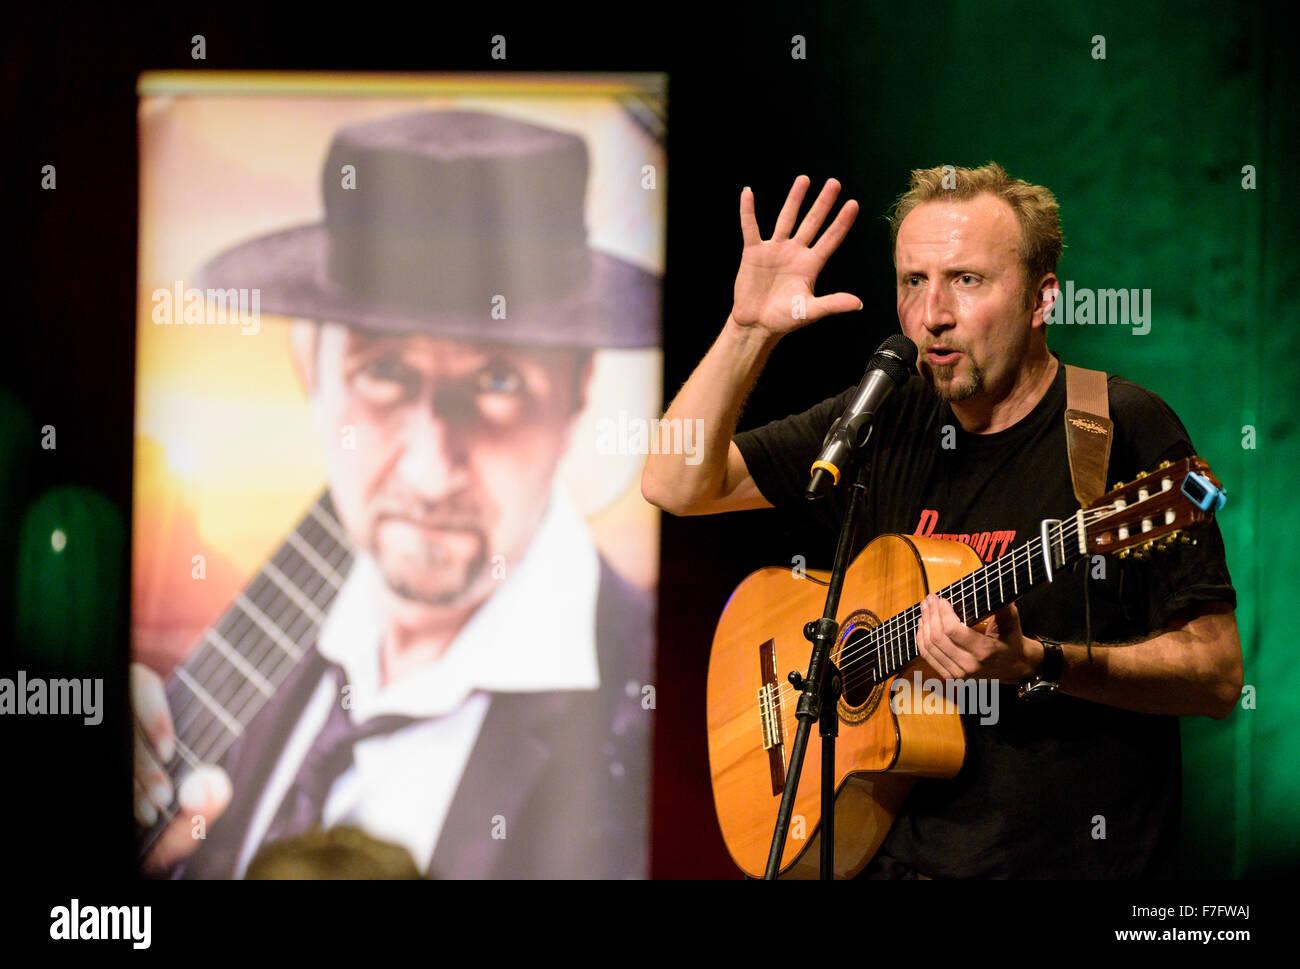 Entertaining artist Helmut Sanftenschneider performs his show 'RuhrpottBanderas'. - Stock Image